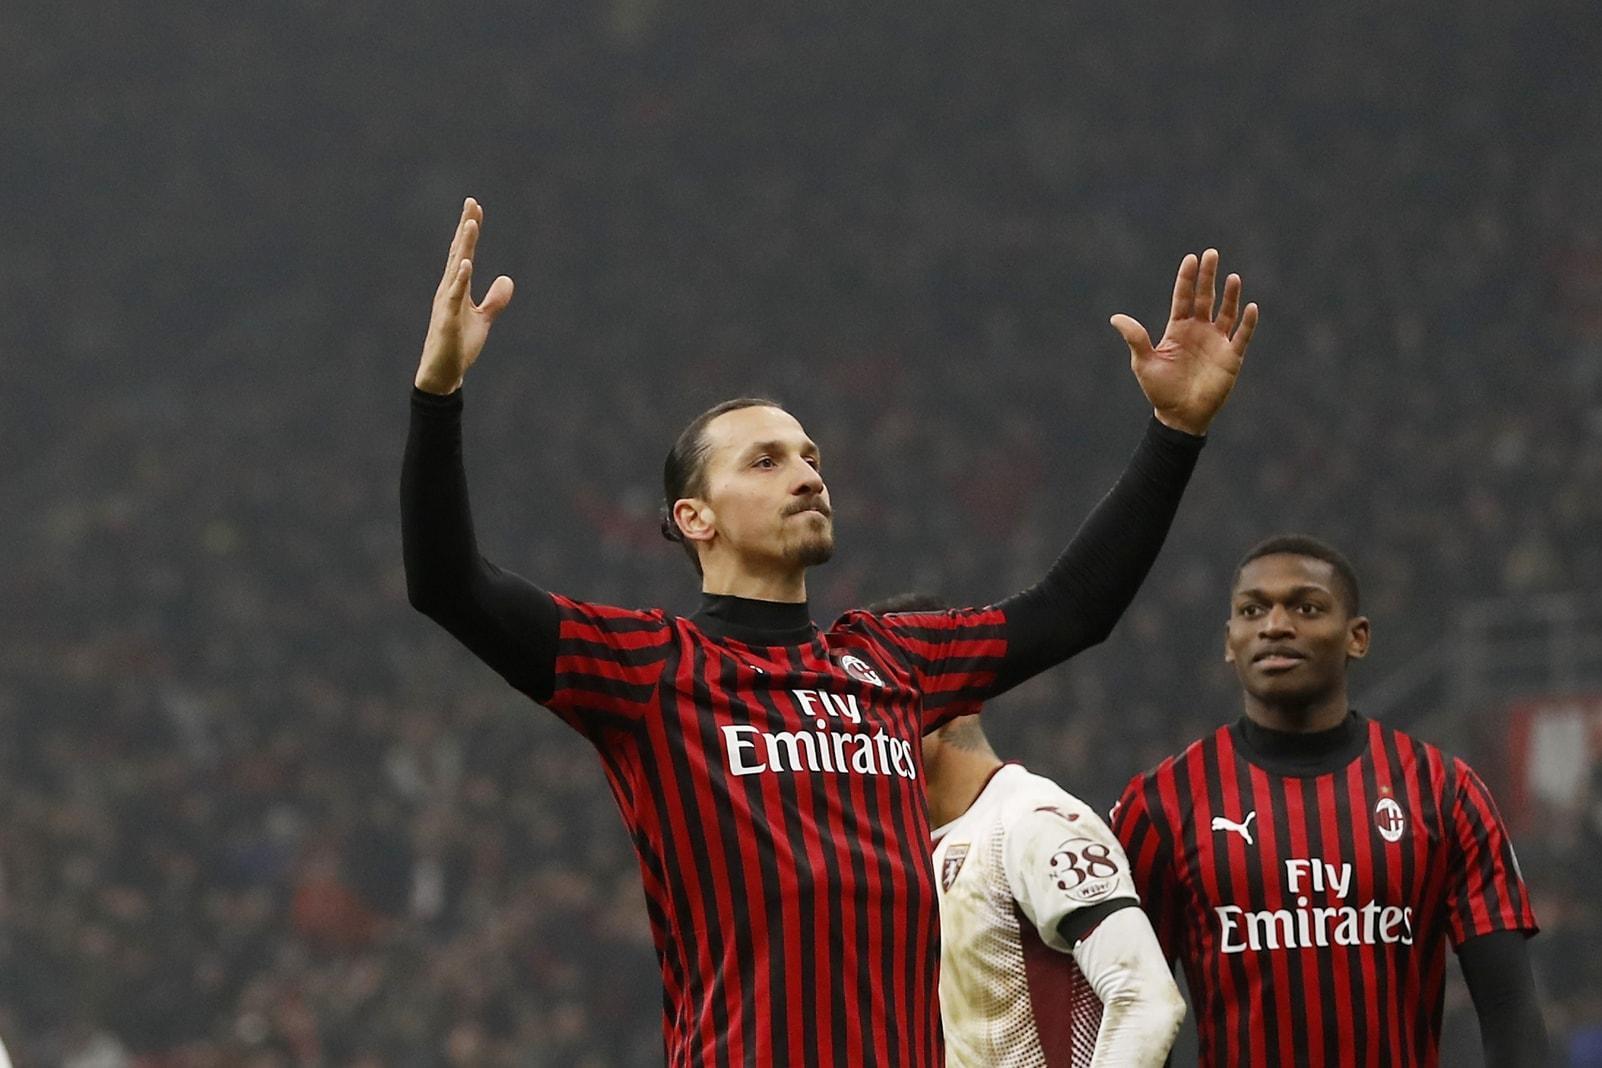 Zlatan Ibrahimovic AC Mailand 10